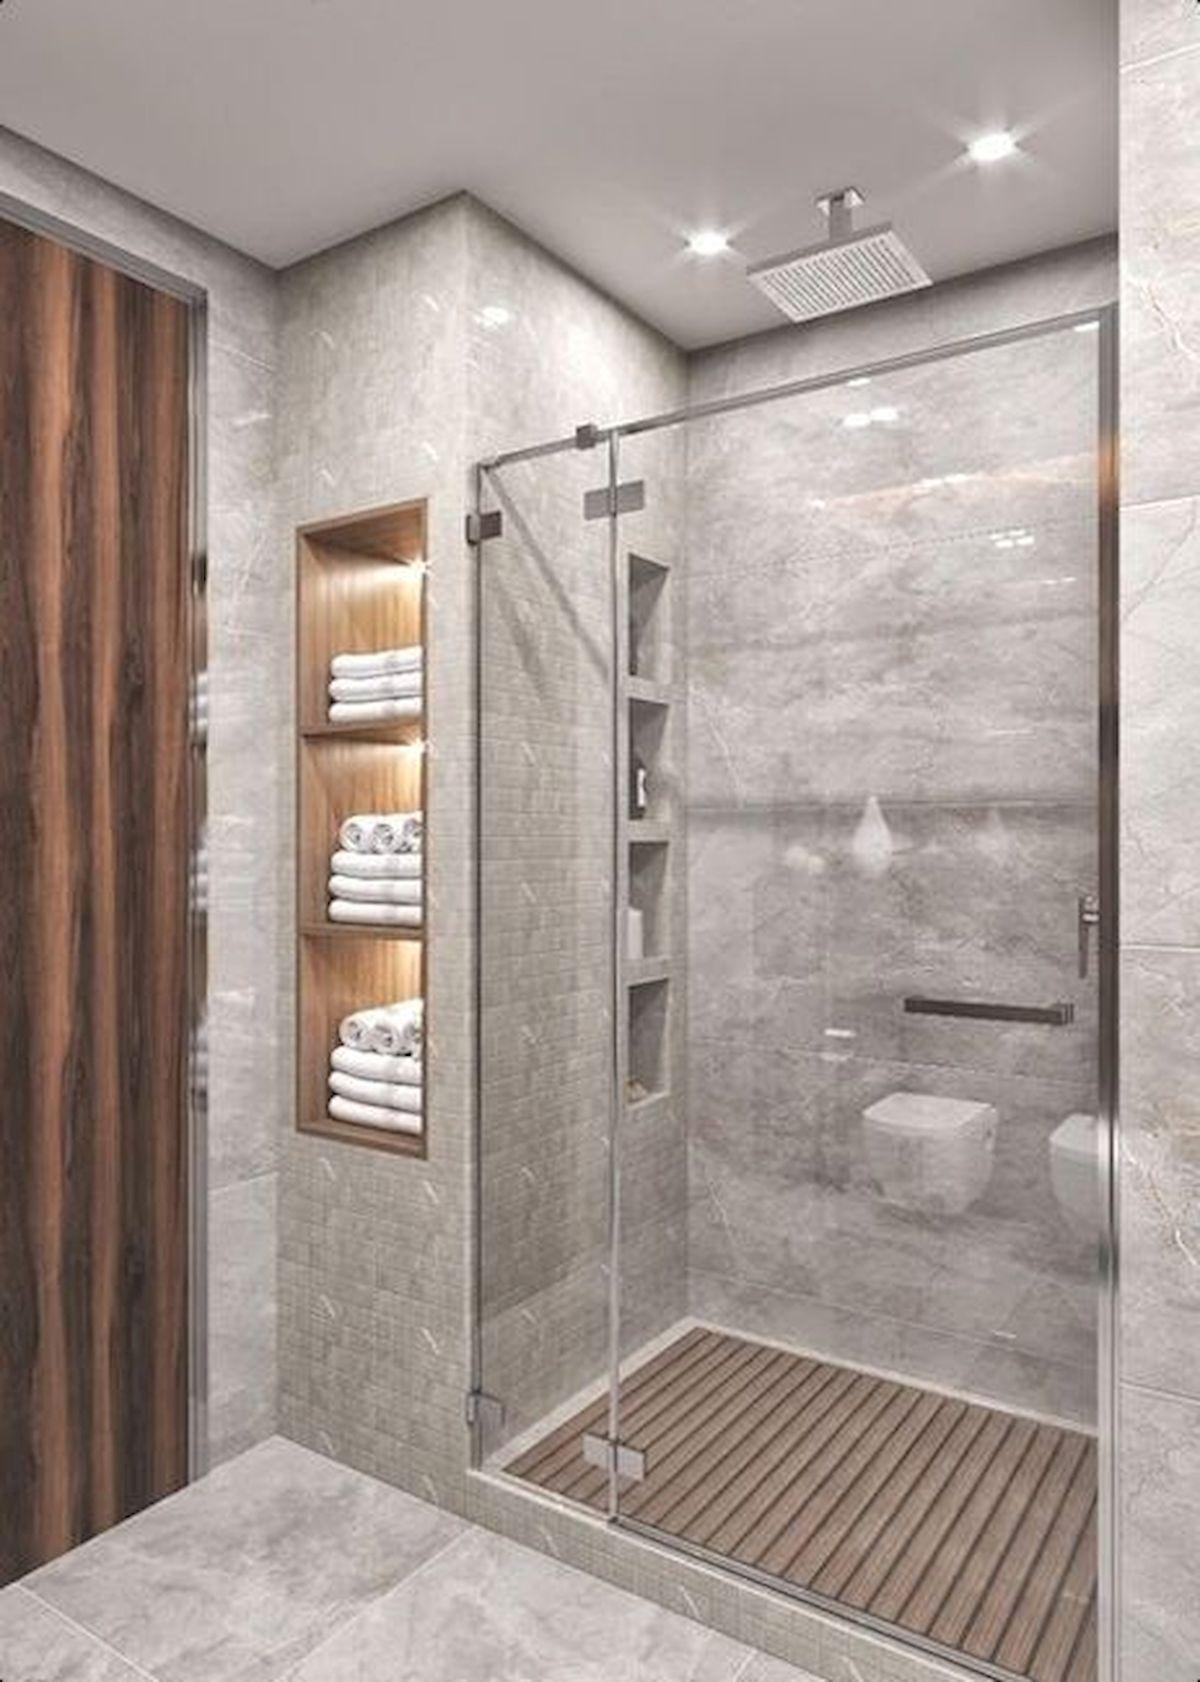 Gray Bathroom Ideas Welcome To Our Main Gray Bathrooms Image Gallery Showcasing Small Bathroom Makeover Small Bathroom Remodel Designs Modern Bathroom Design